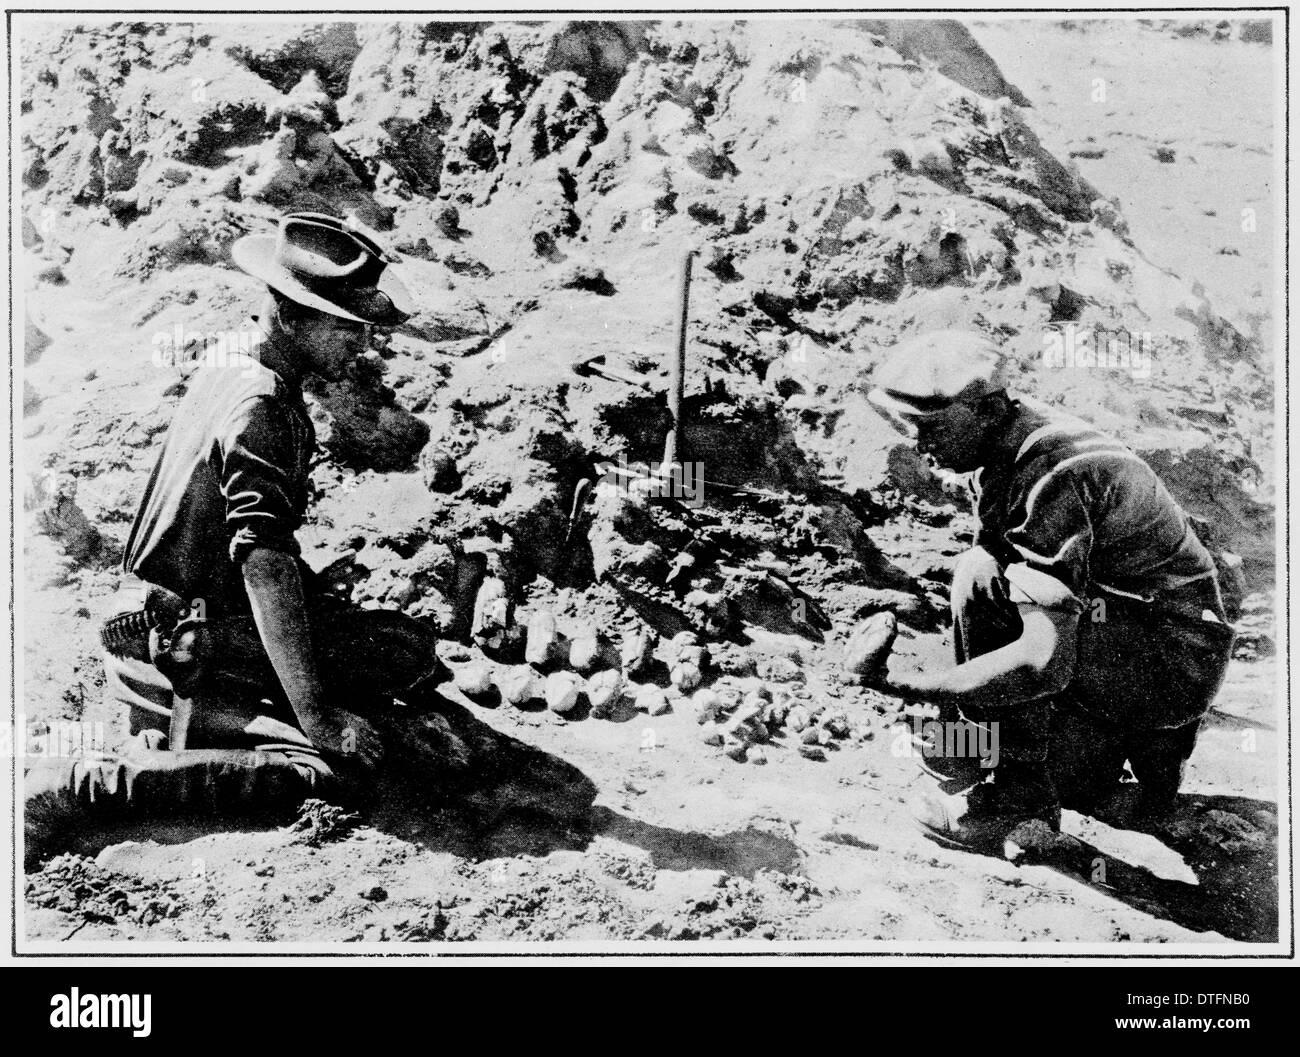 Dinosaur egg excavation, 1925 - Stock Image